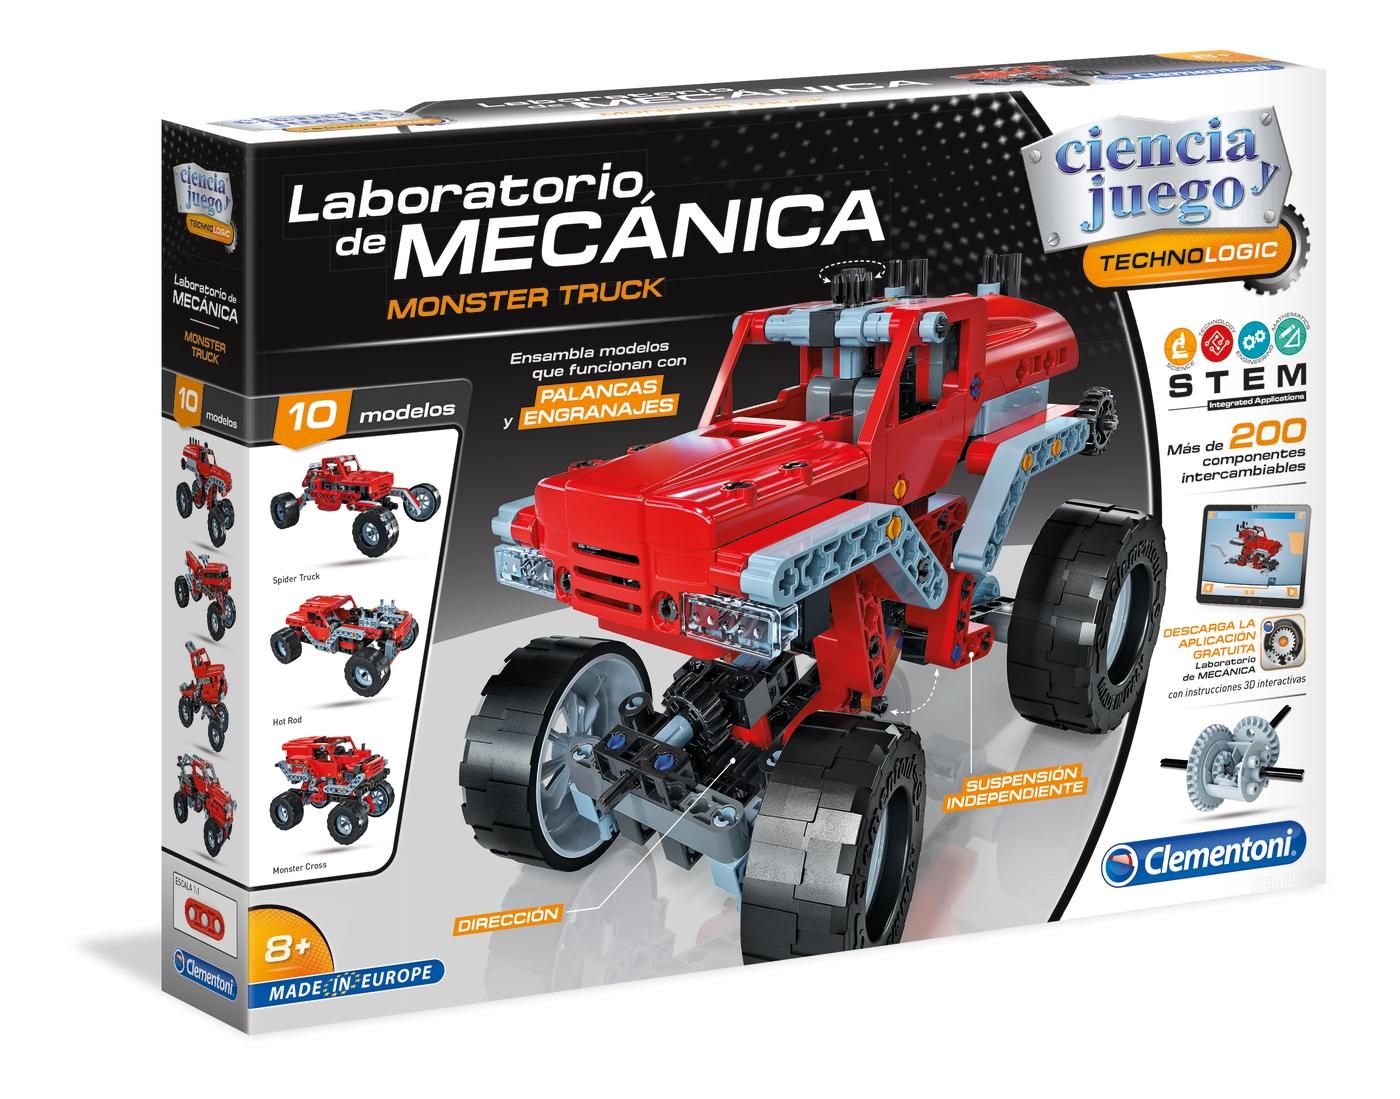 LABORATORIO DE  MECANICA MONSTER TRUCK 55277